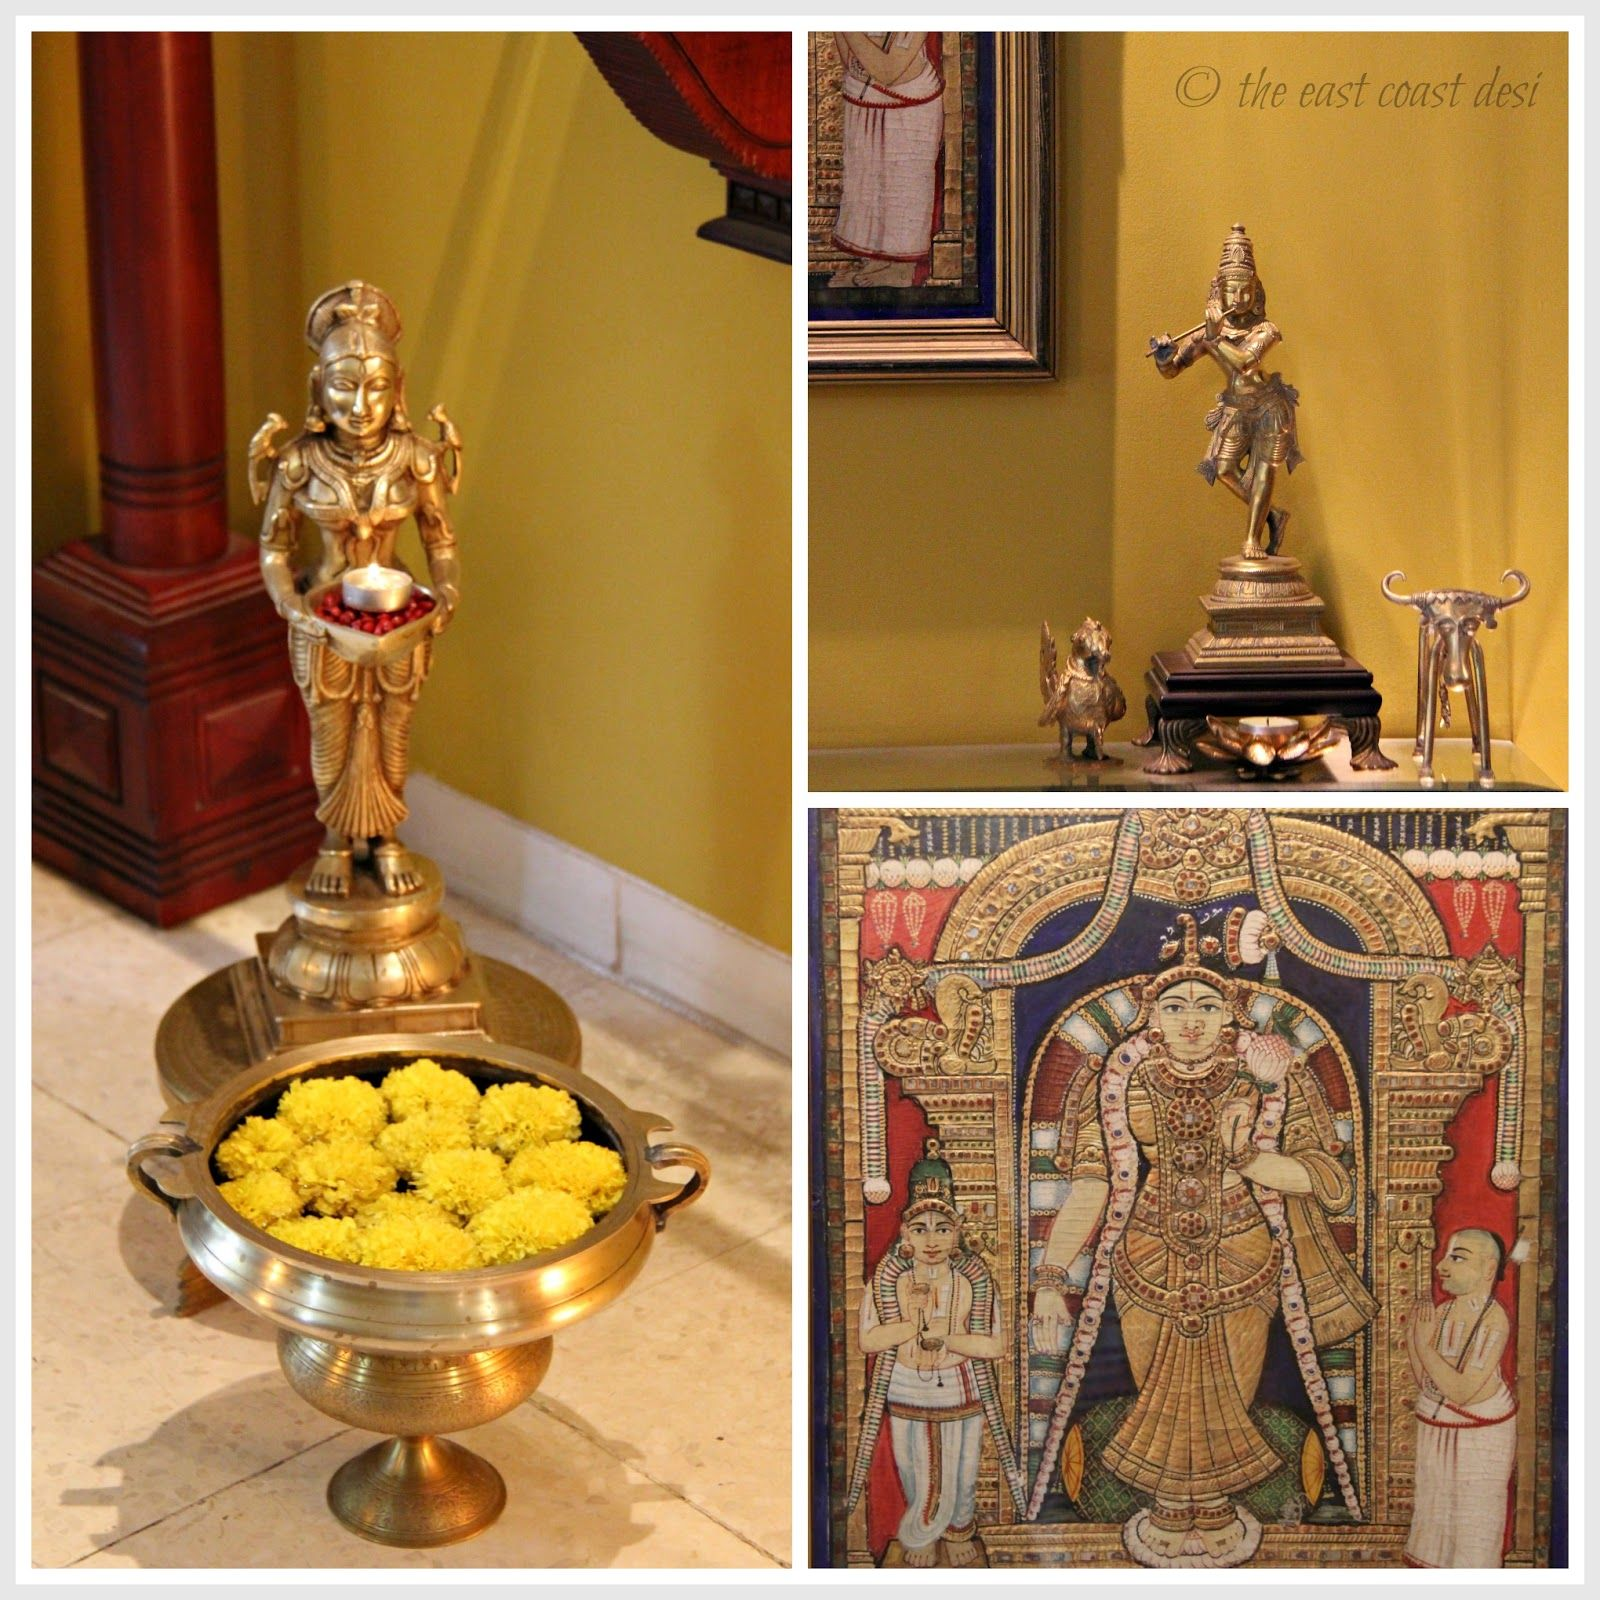 D'life home interiors - kottayam kottayam kerala tucked away from the cacophonous buzz of metropolitan bengaluru the